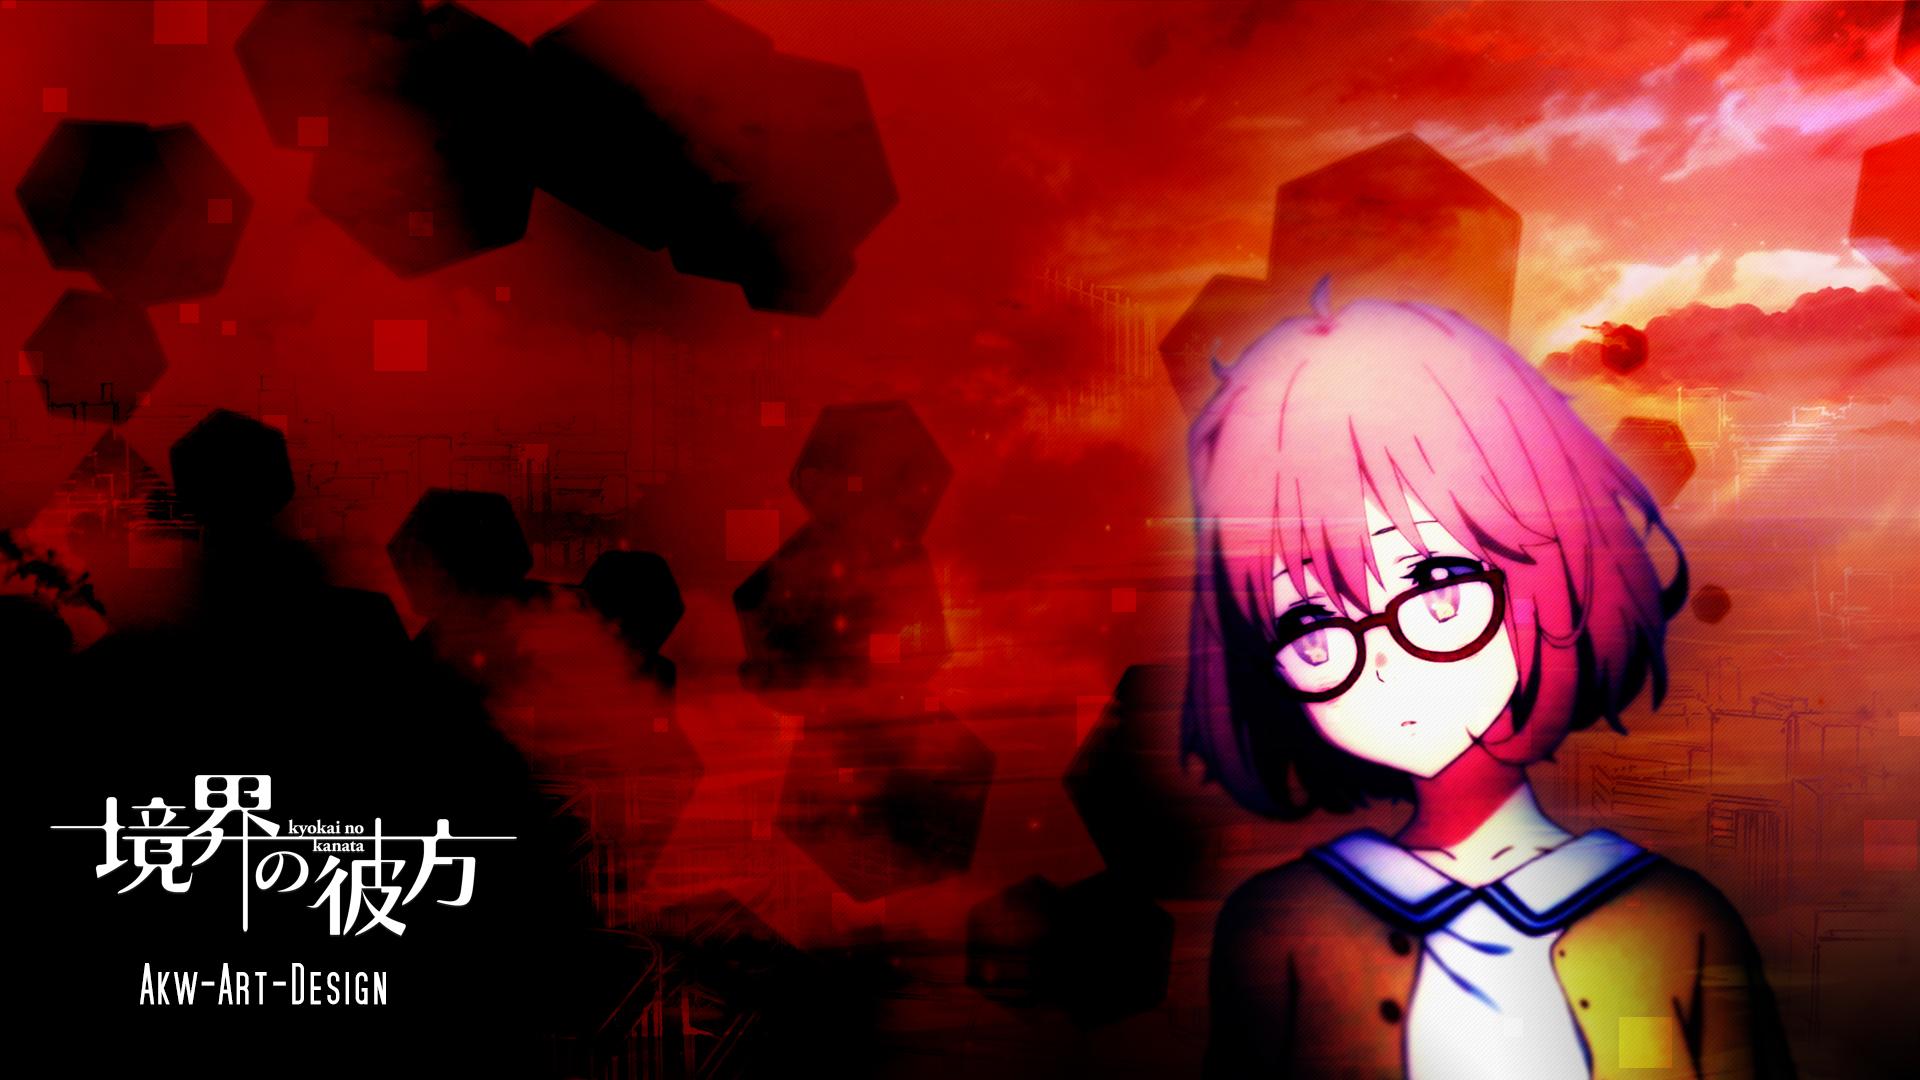 ~Wallpaper Anime~ Kyoukai_no_kanata_kuriyama_mirai_by_akw_art_design-d6s0mwy